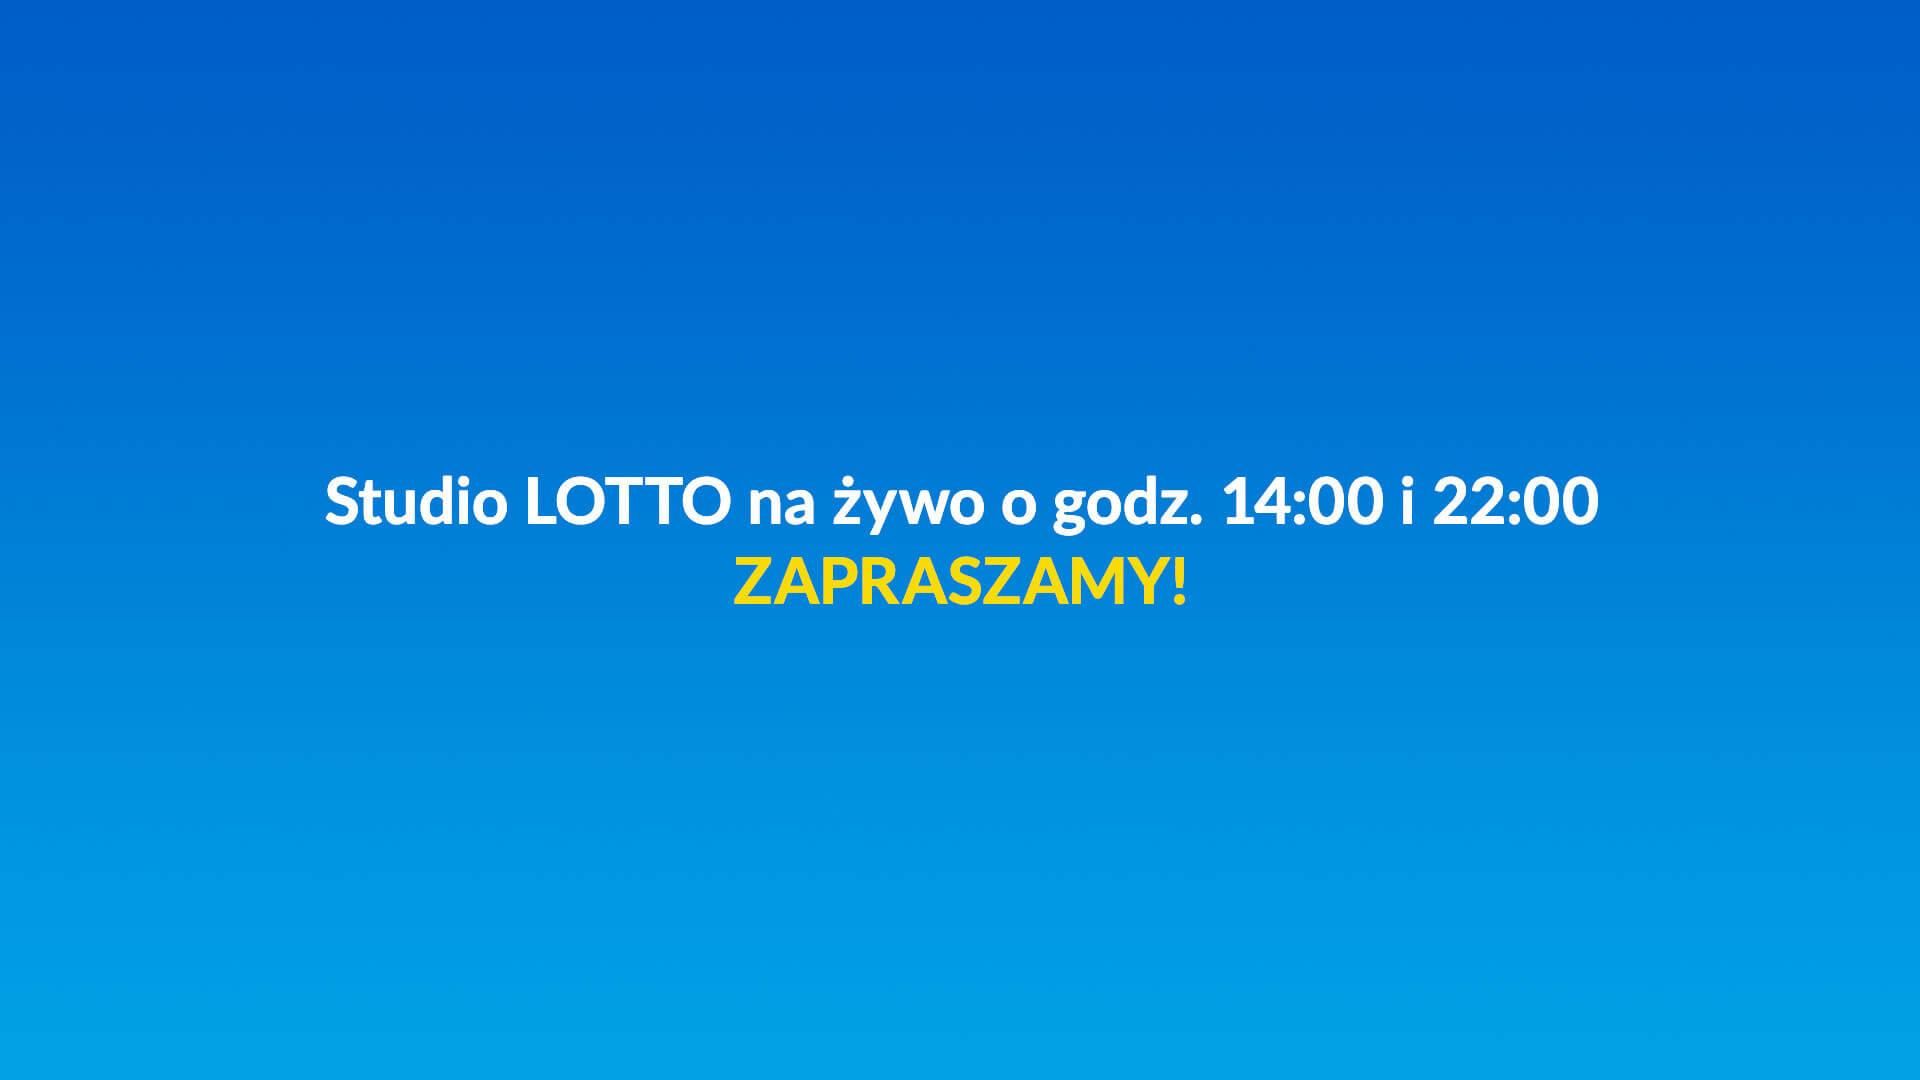 Studio Lotto